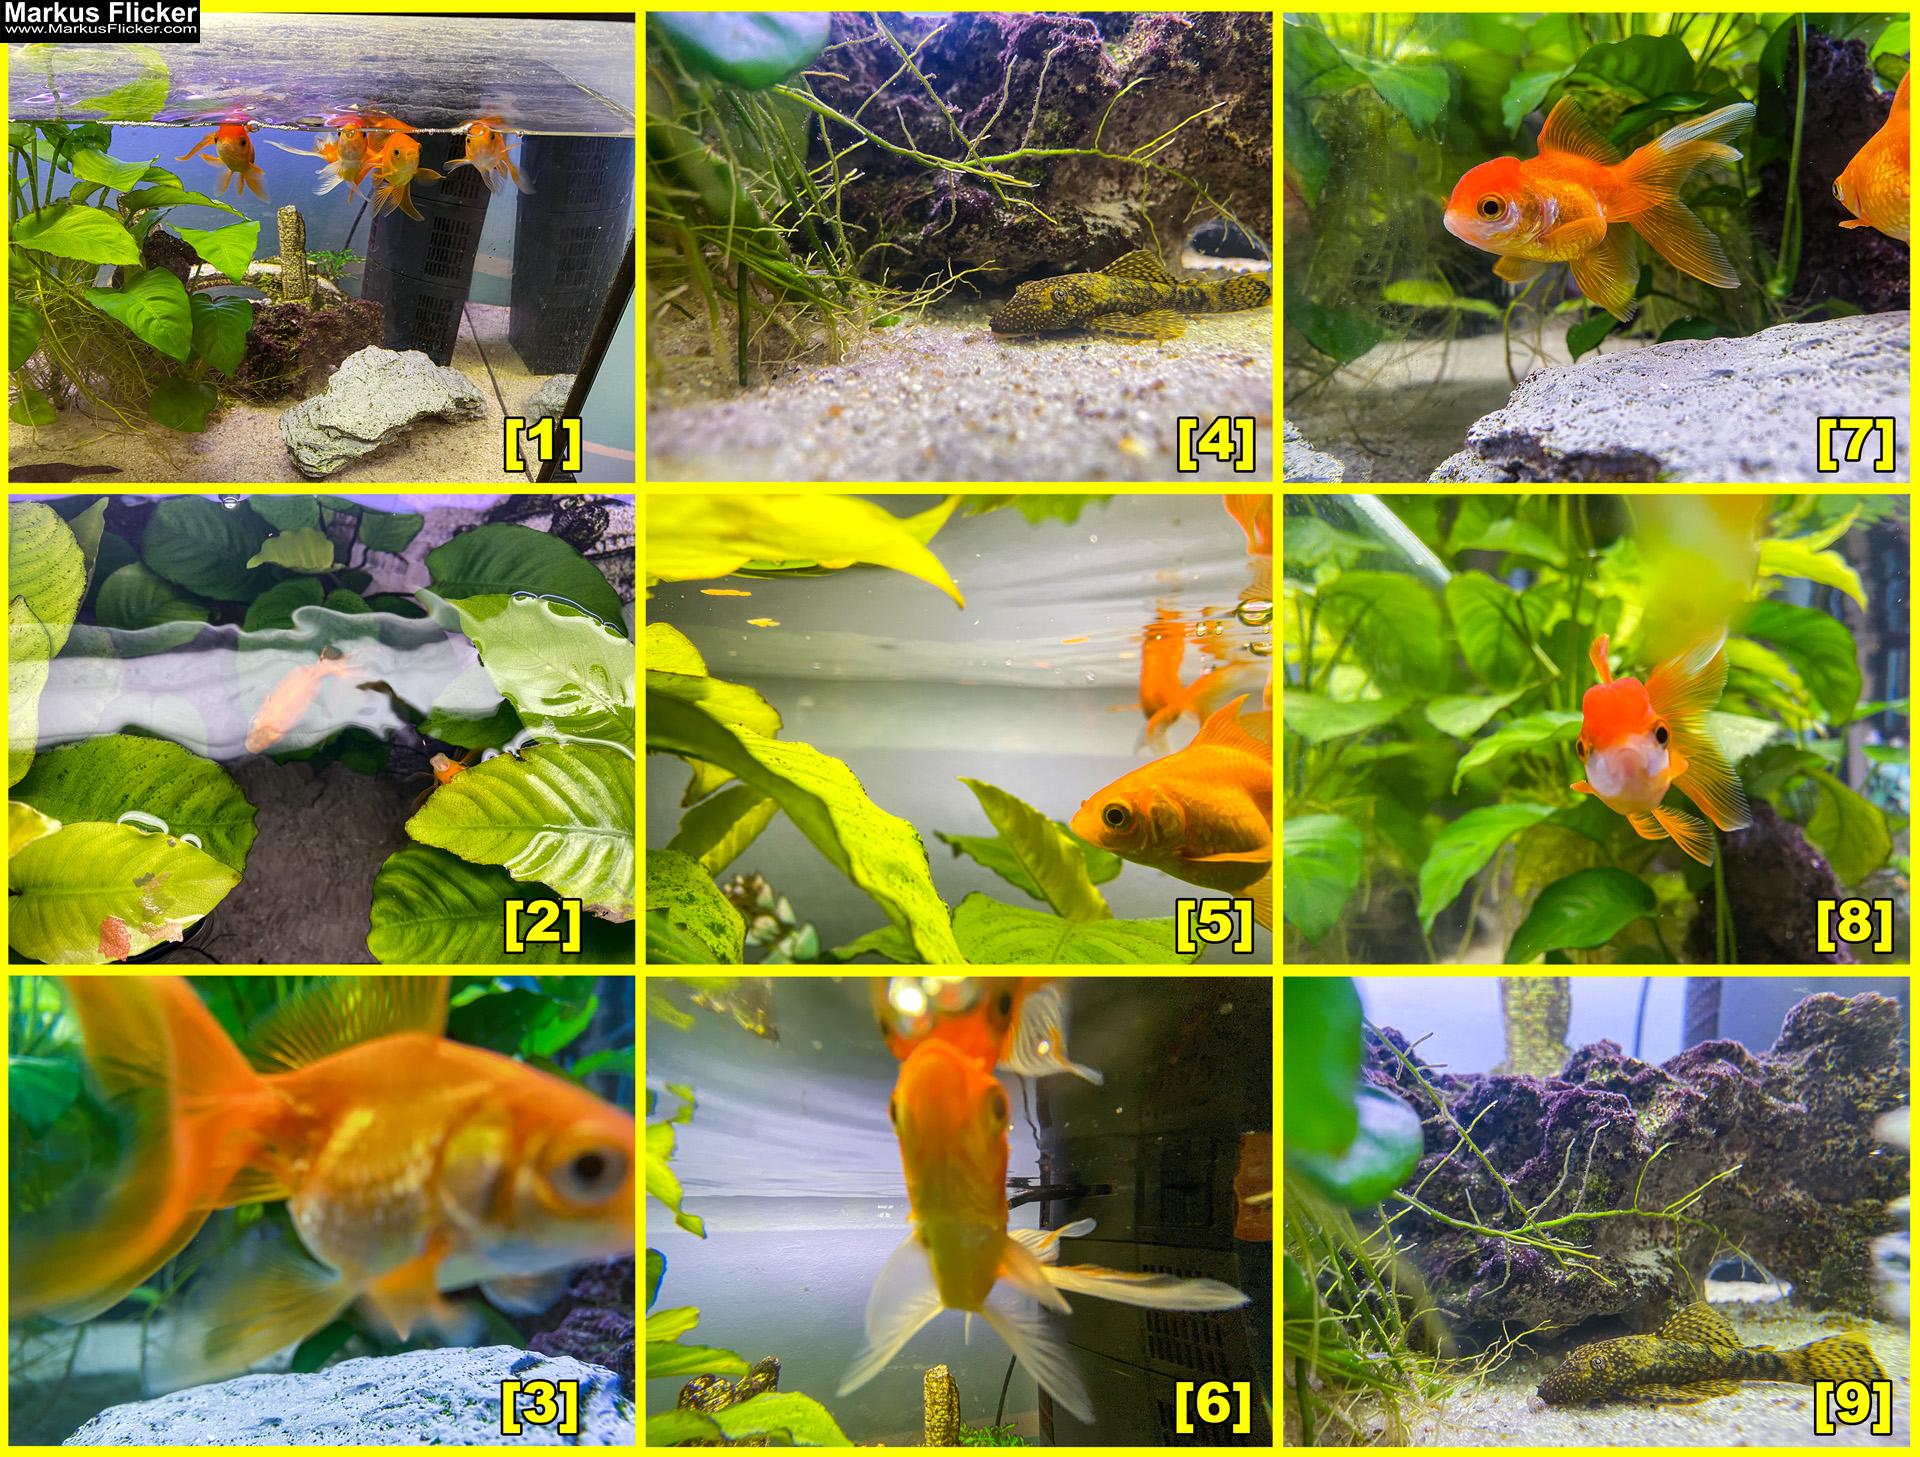 Fische im Aquarium fotografieren